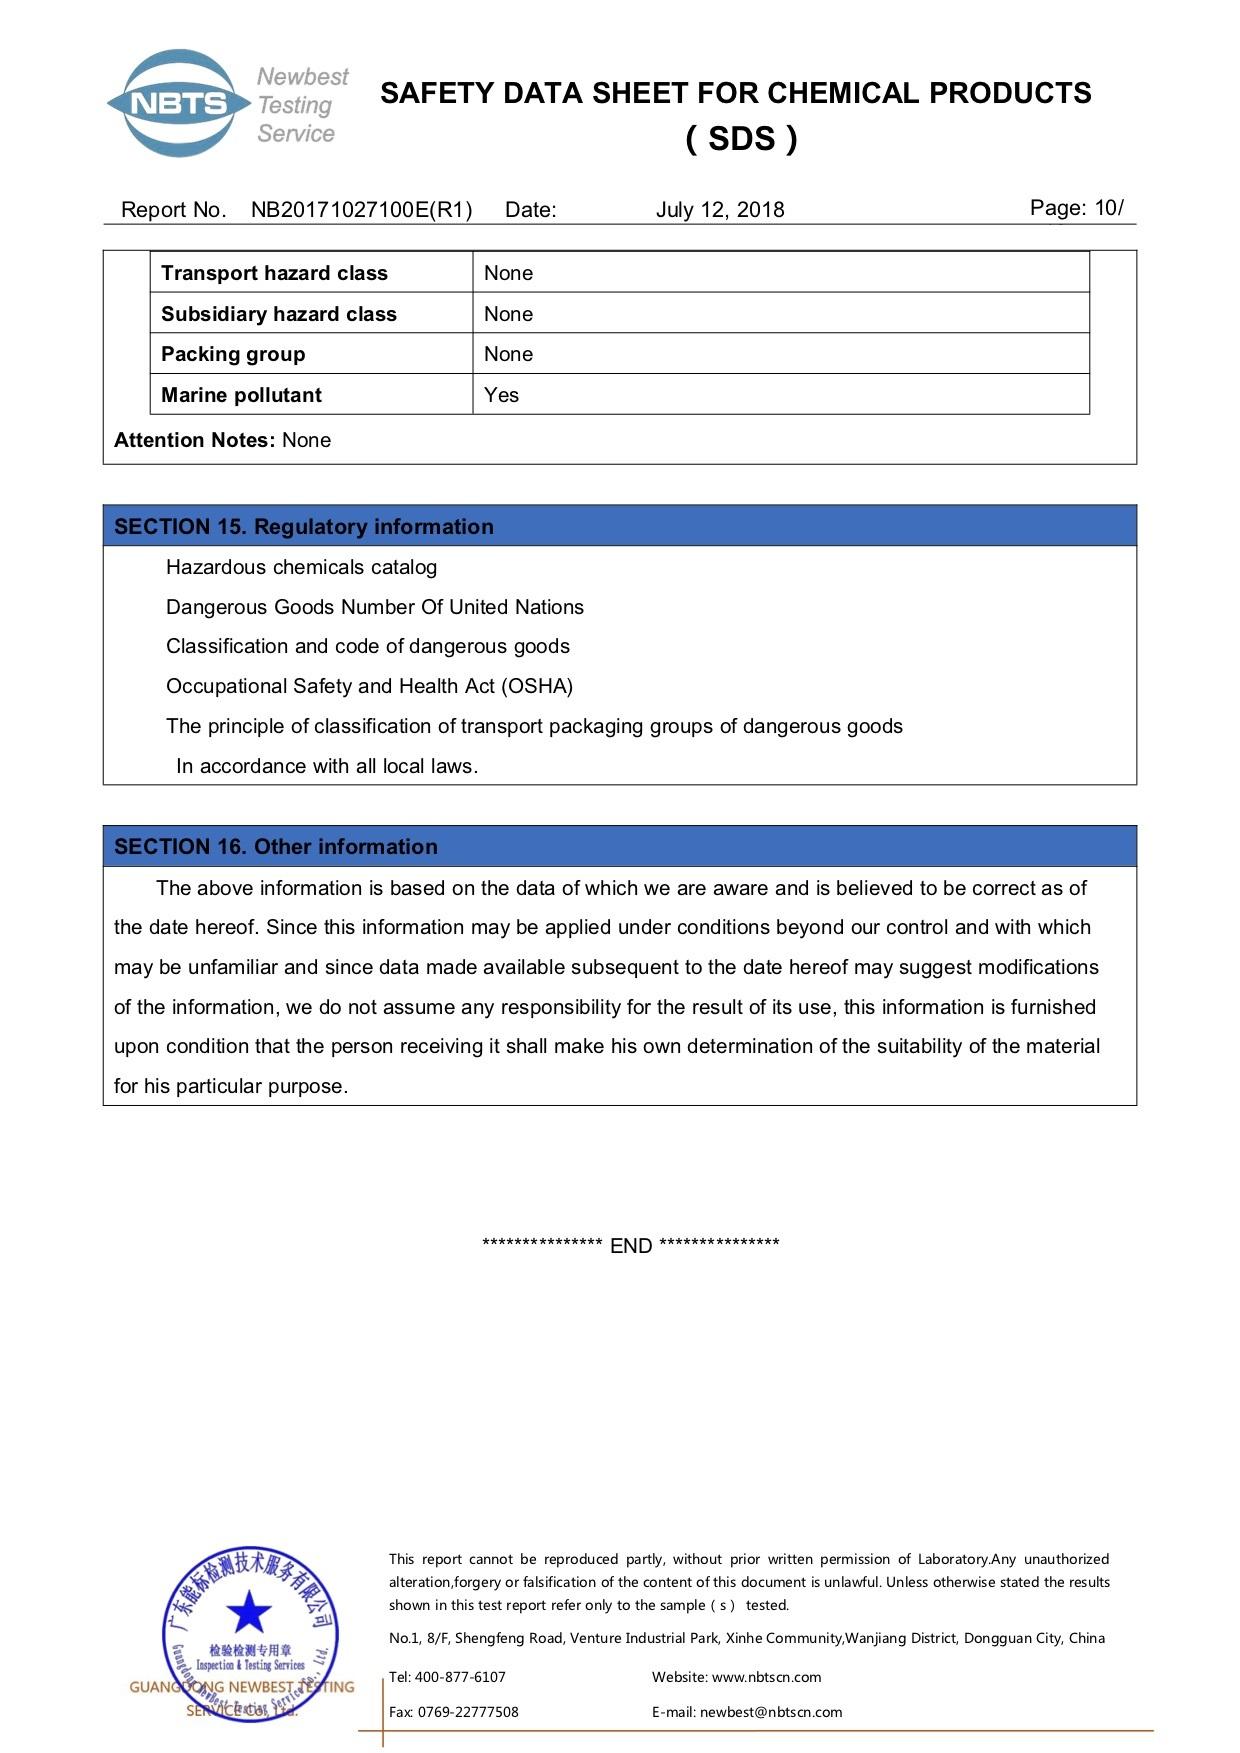 ANYCUBIC Паспорт безопасности химической продукции